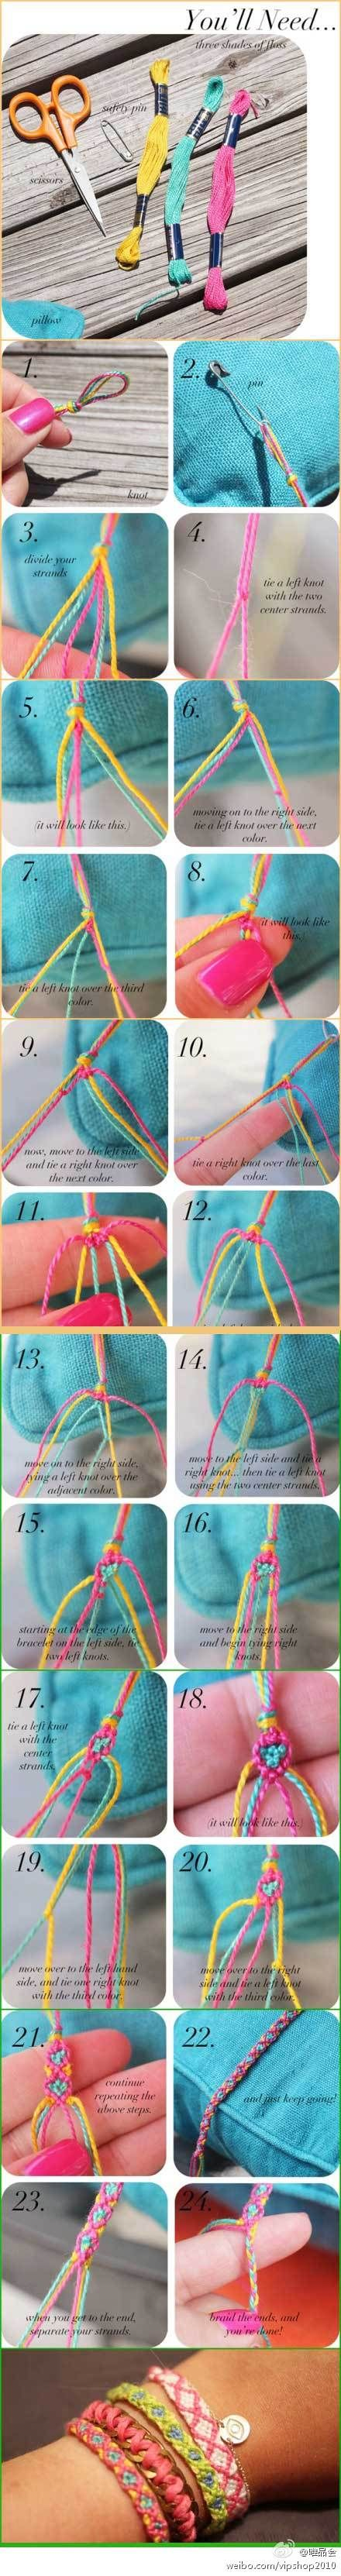 Macrame Inspiring Bracelets